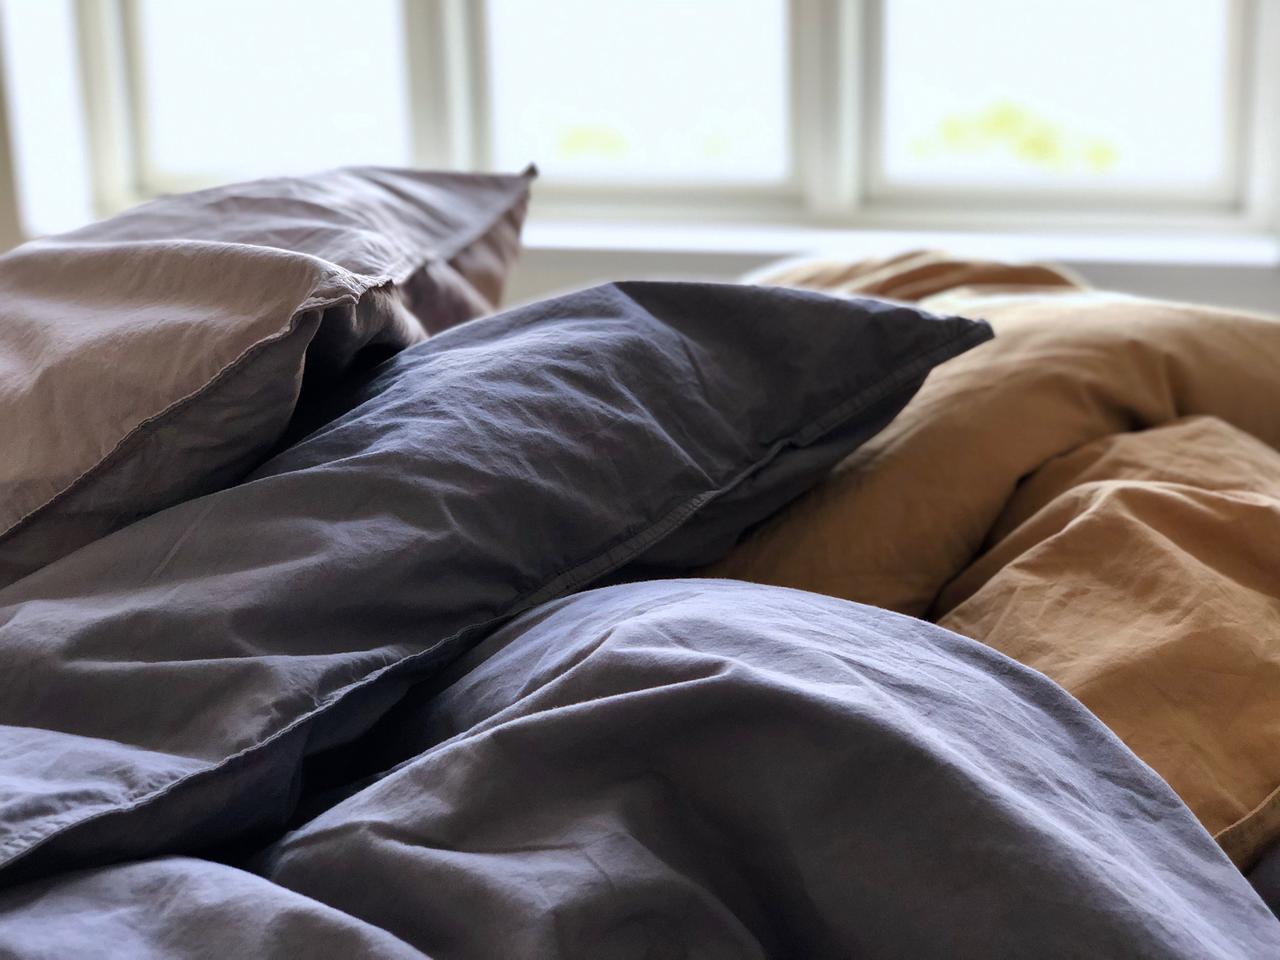 Nordifakt's Christianshavn bedding eliminates 99.9 percent of all bacteria